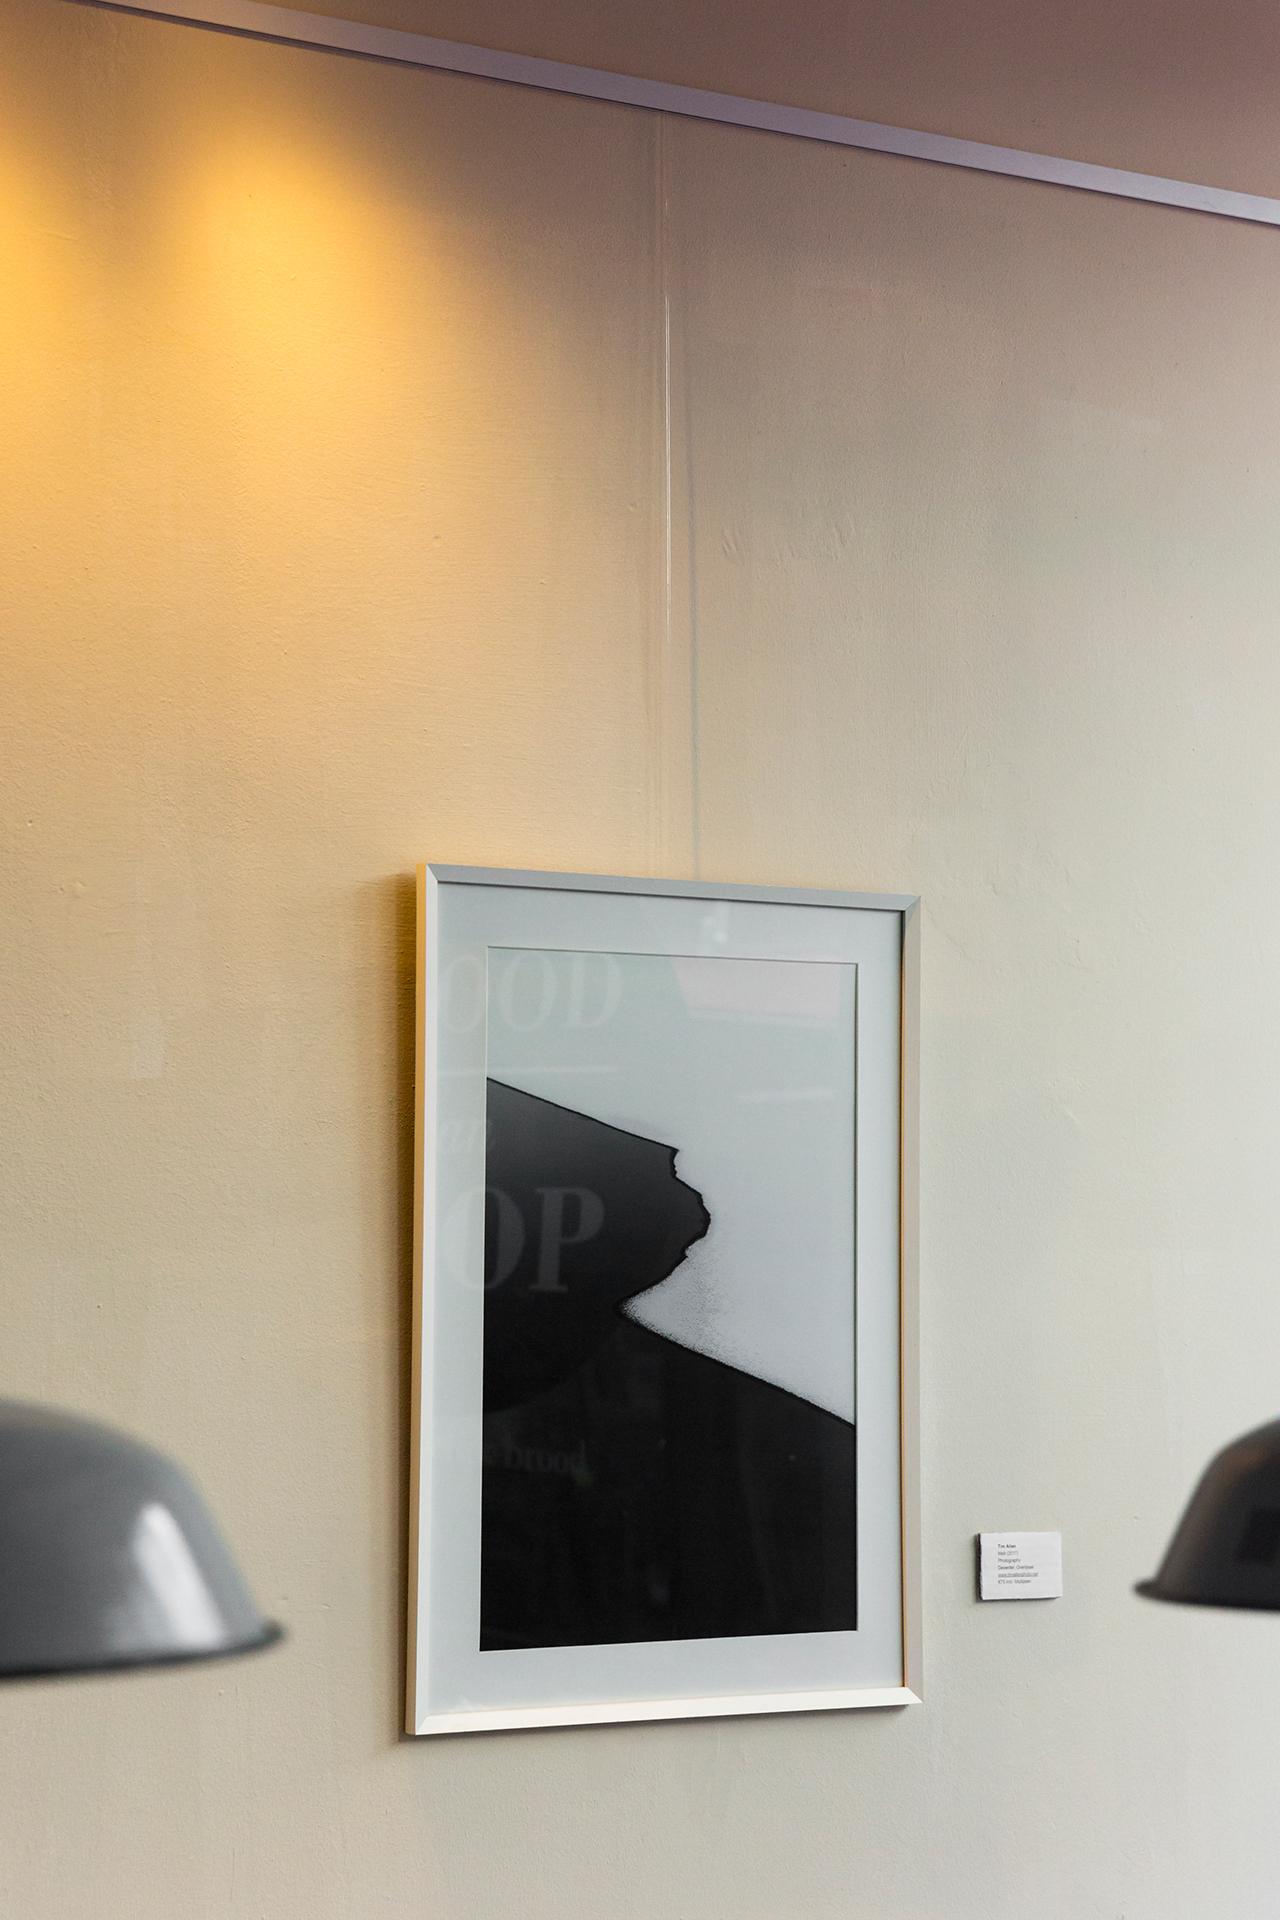 Tim_Allen-Melt-Brood_Van_Joop-Frame.jpg